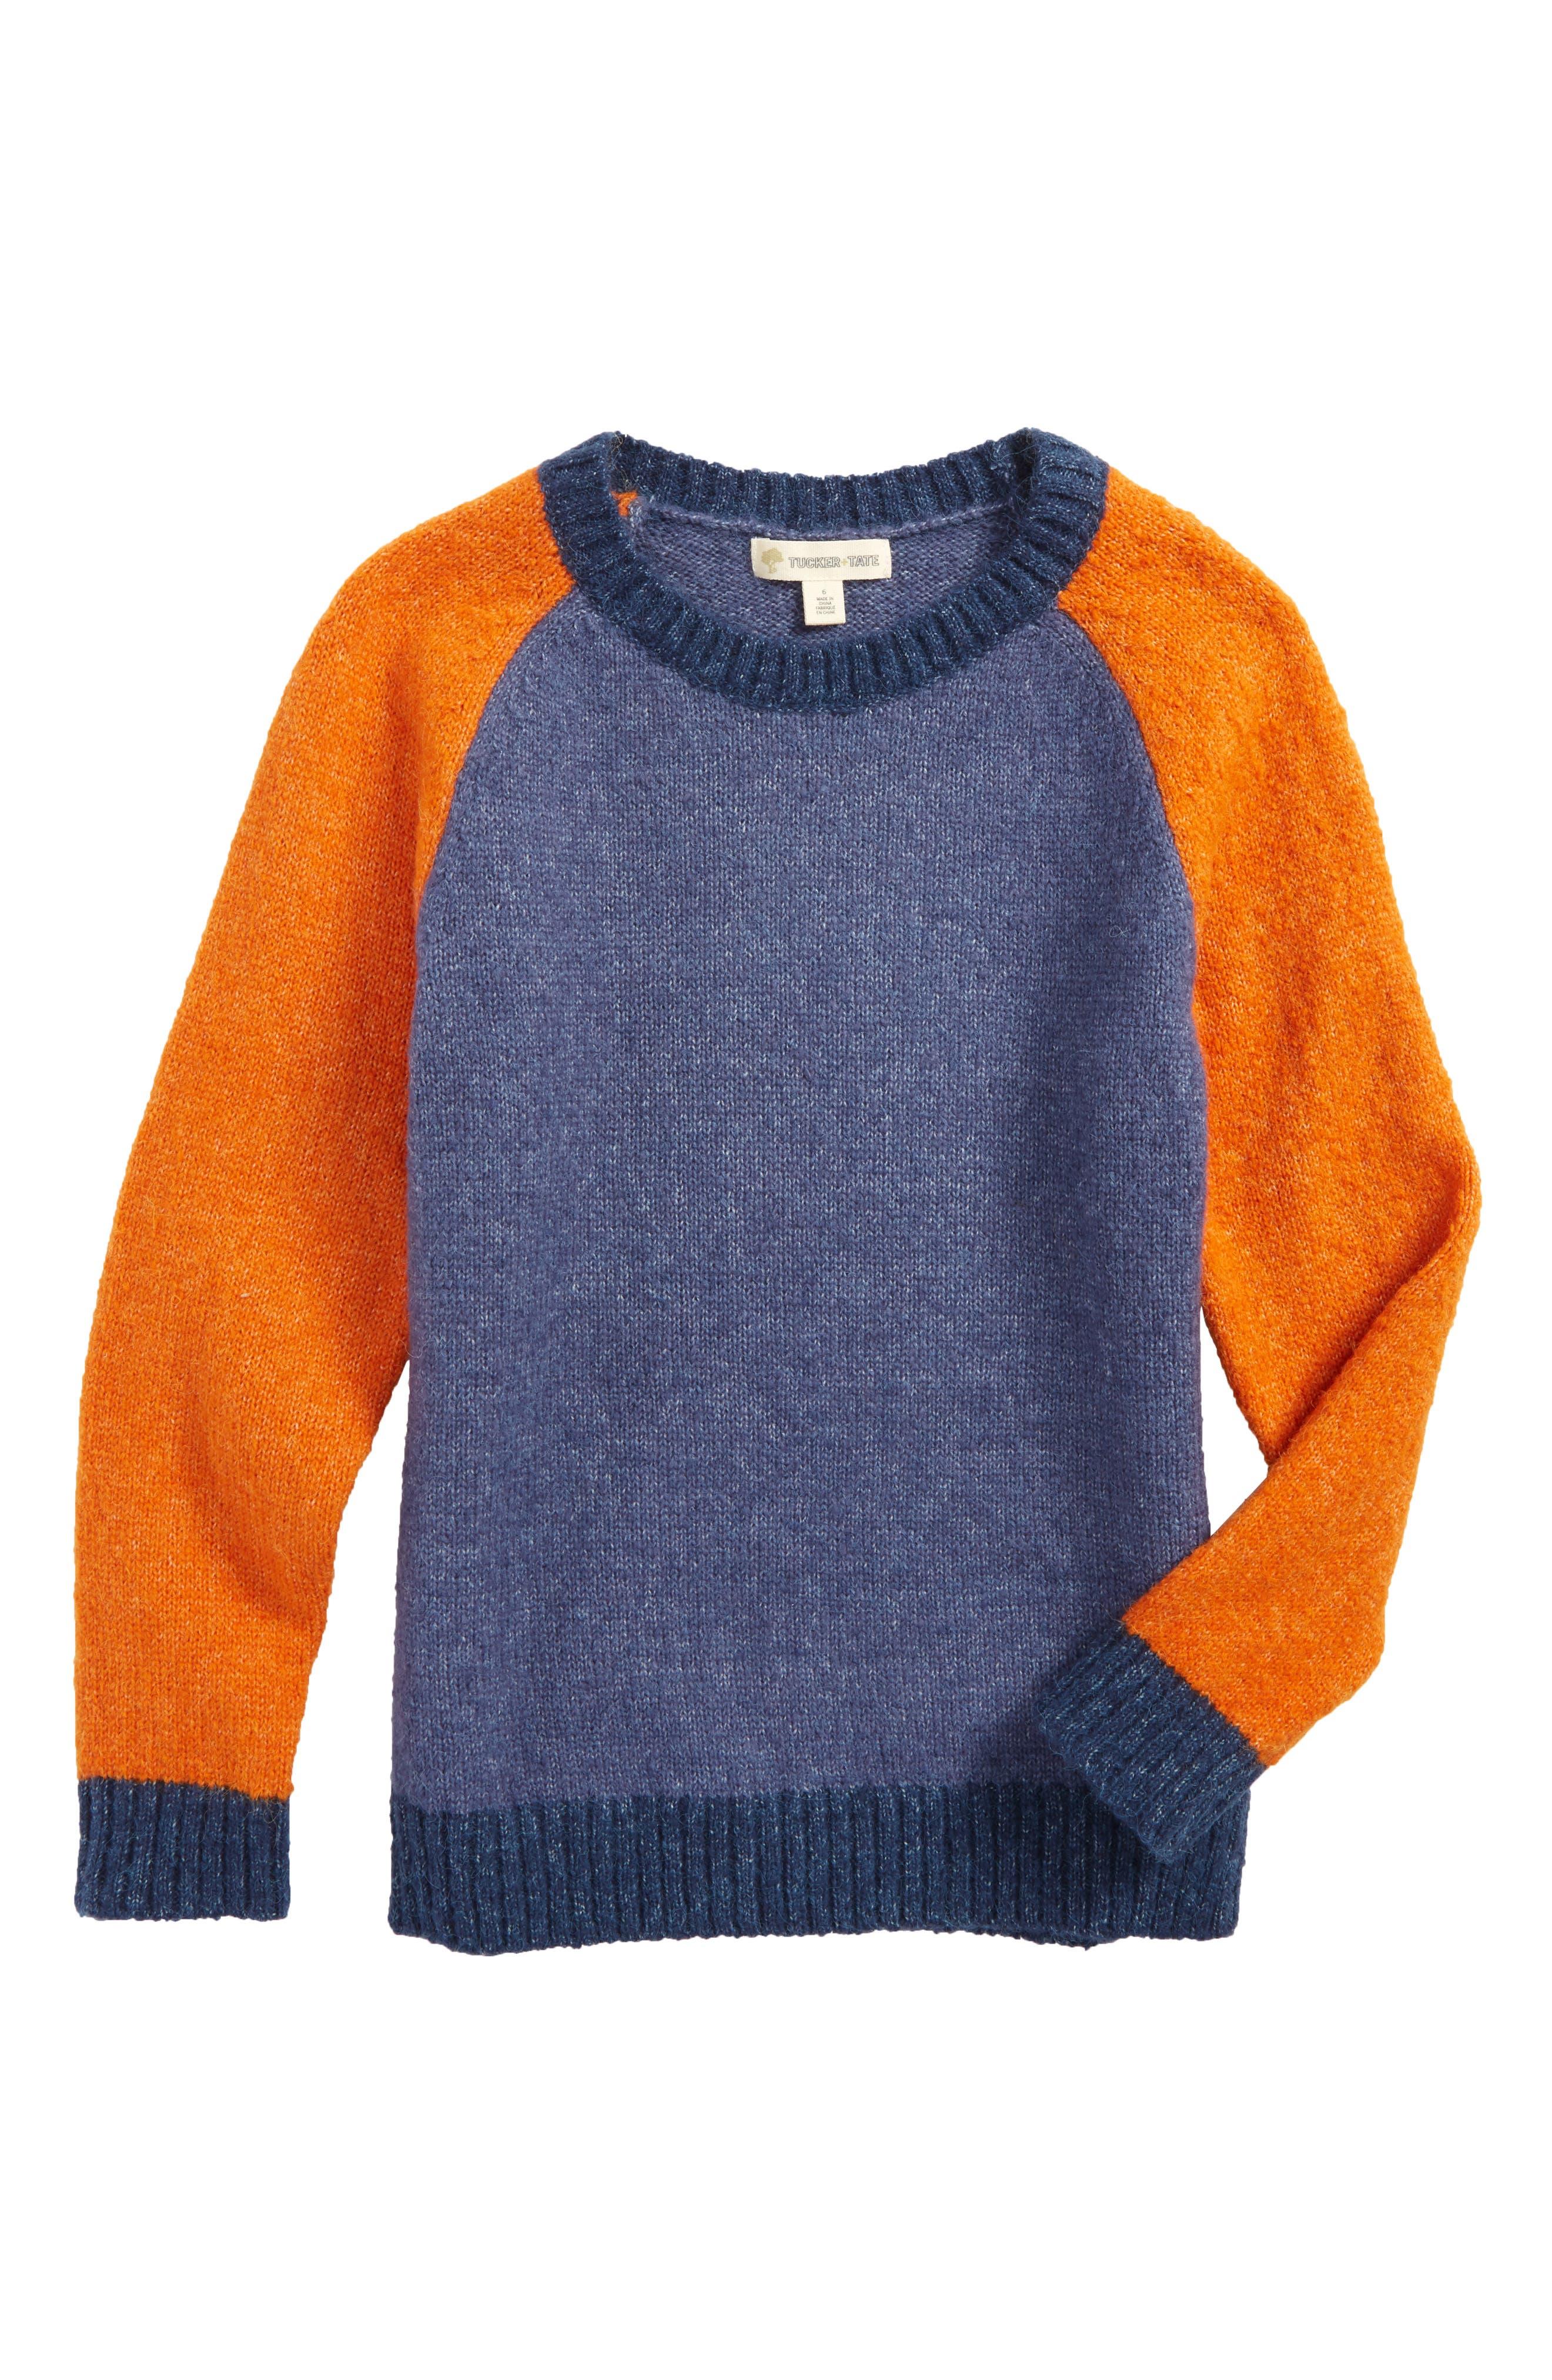 Colorblock Sweater,                         Main,                         color, 420